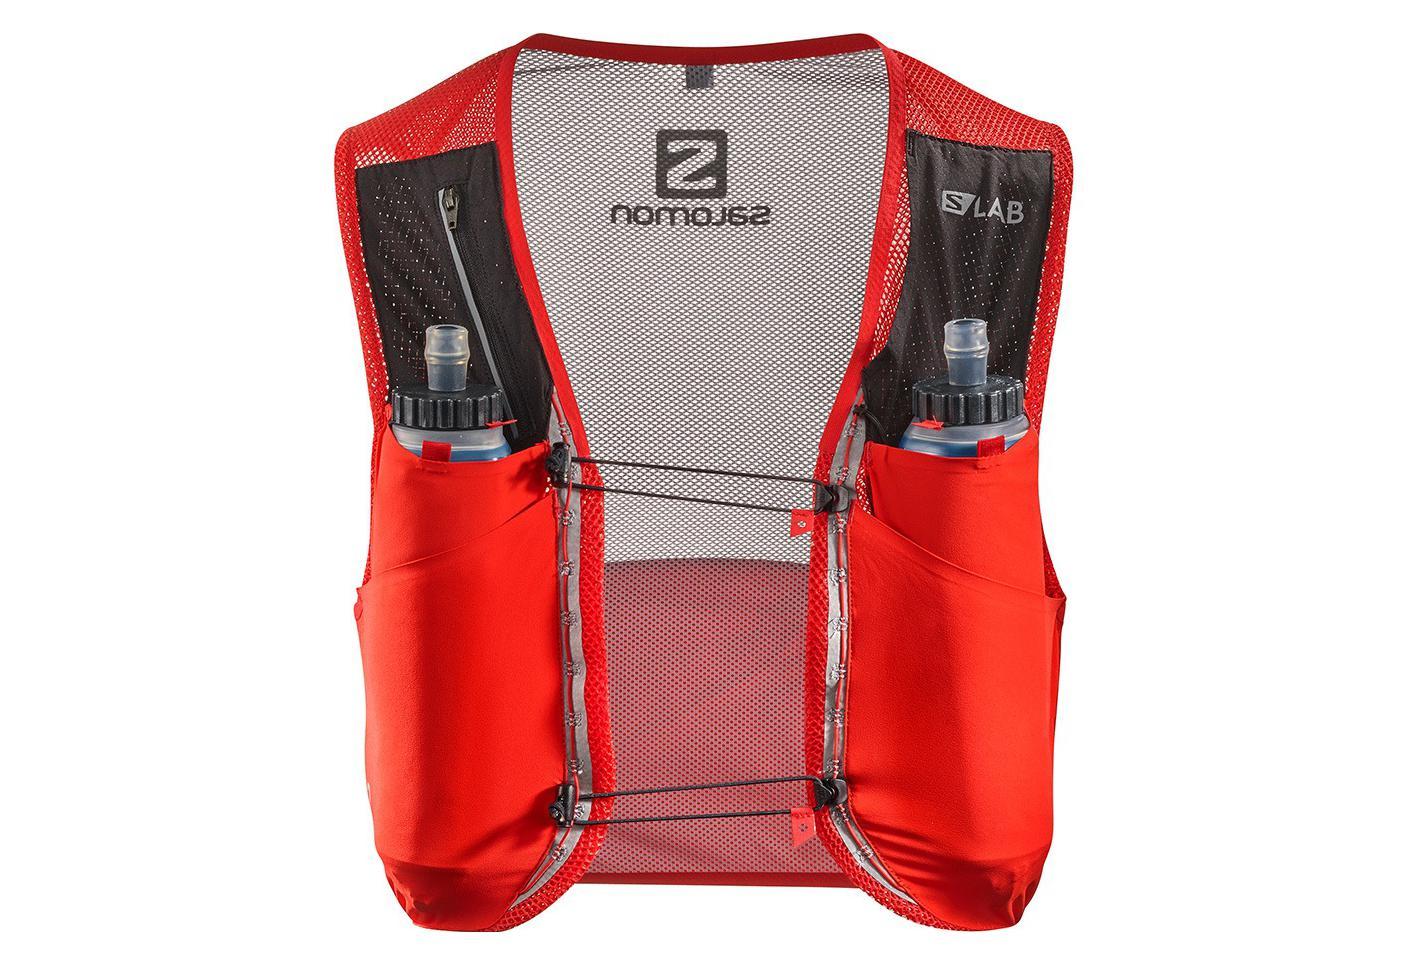 nouvelle collection b04a7 fc267 Salomon Bag S-Lab Sense Ultra 5 Racing Set Red